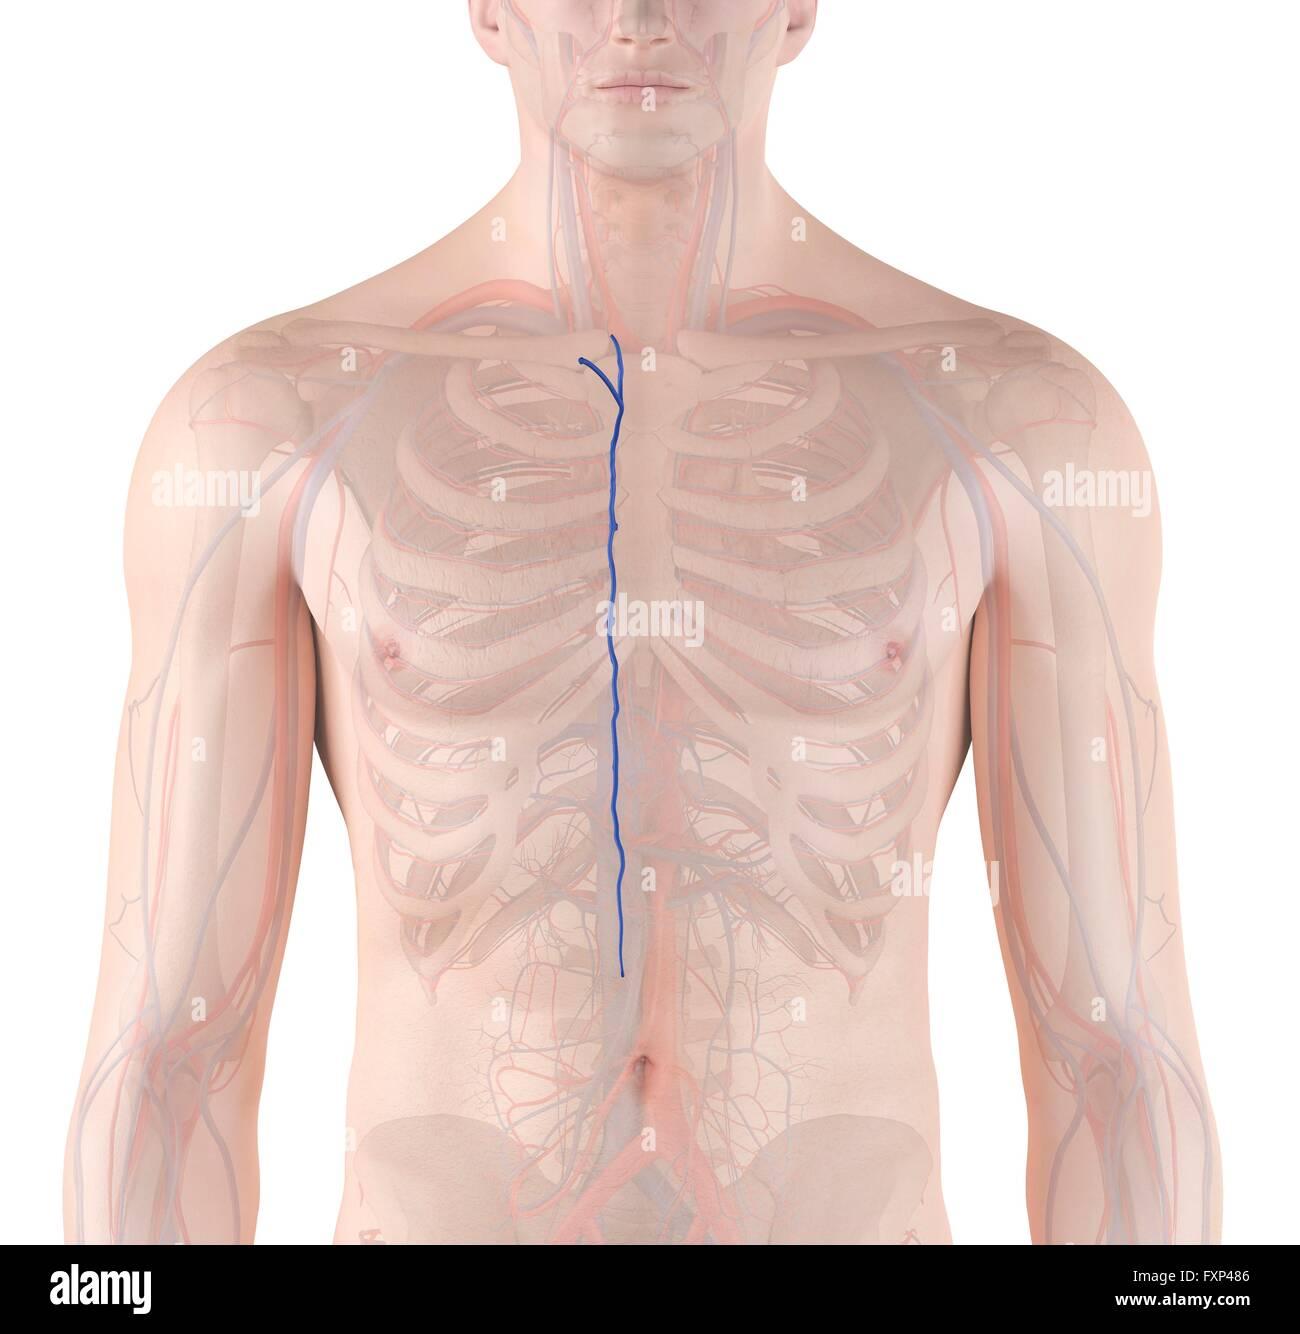 Human Vascular System Computer Illustration Stock Photo Royalty